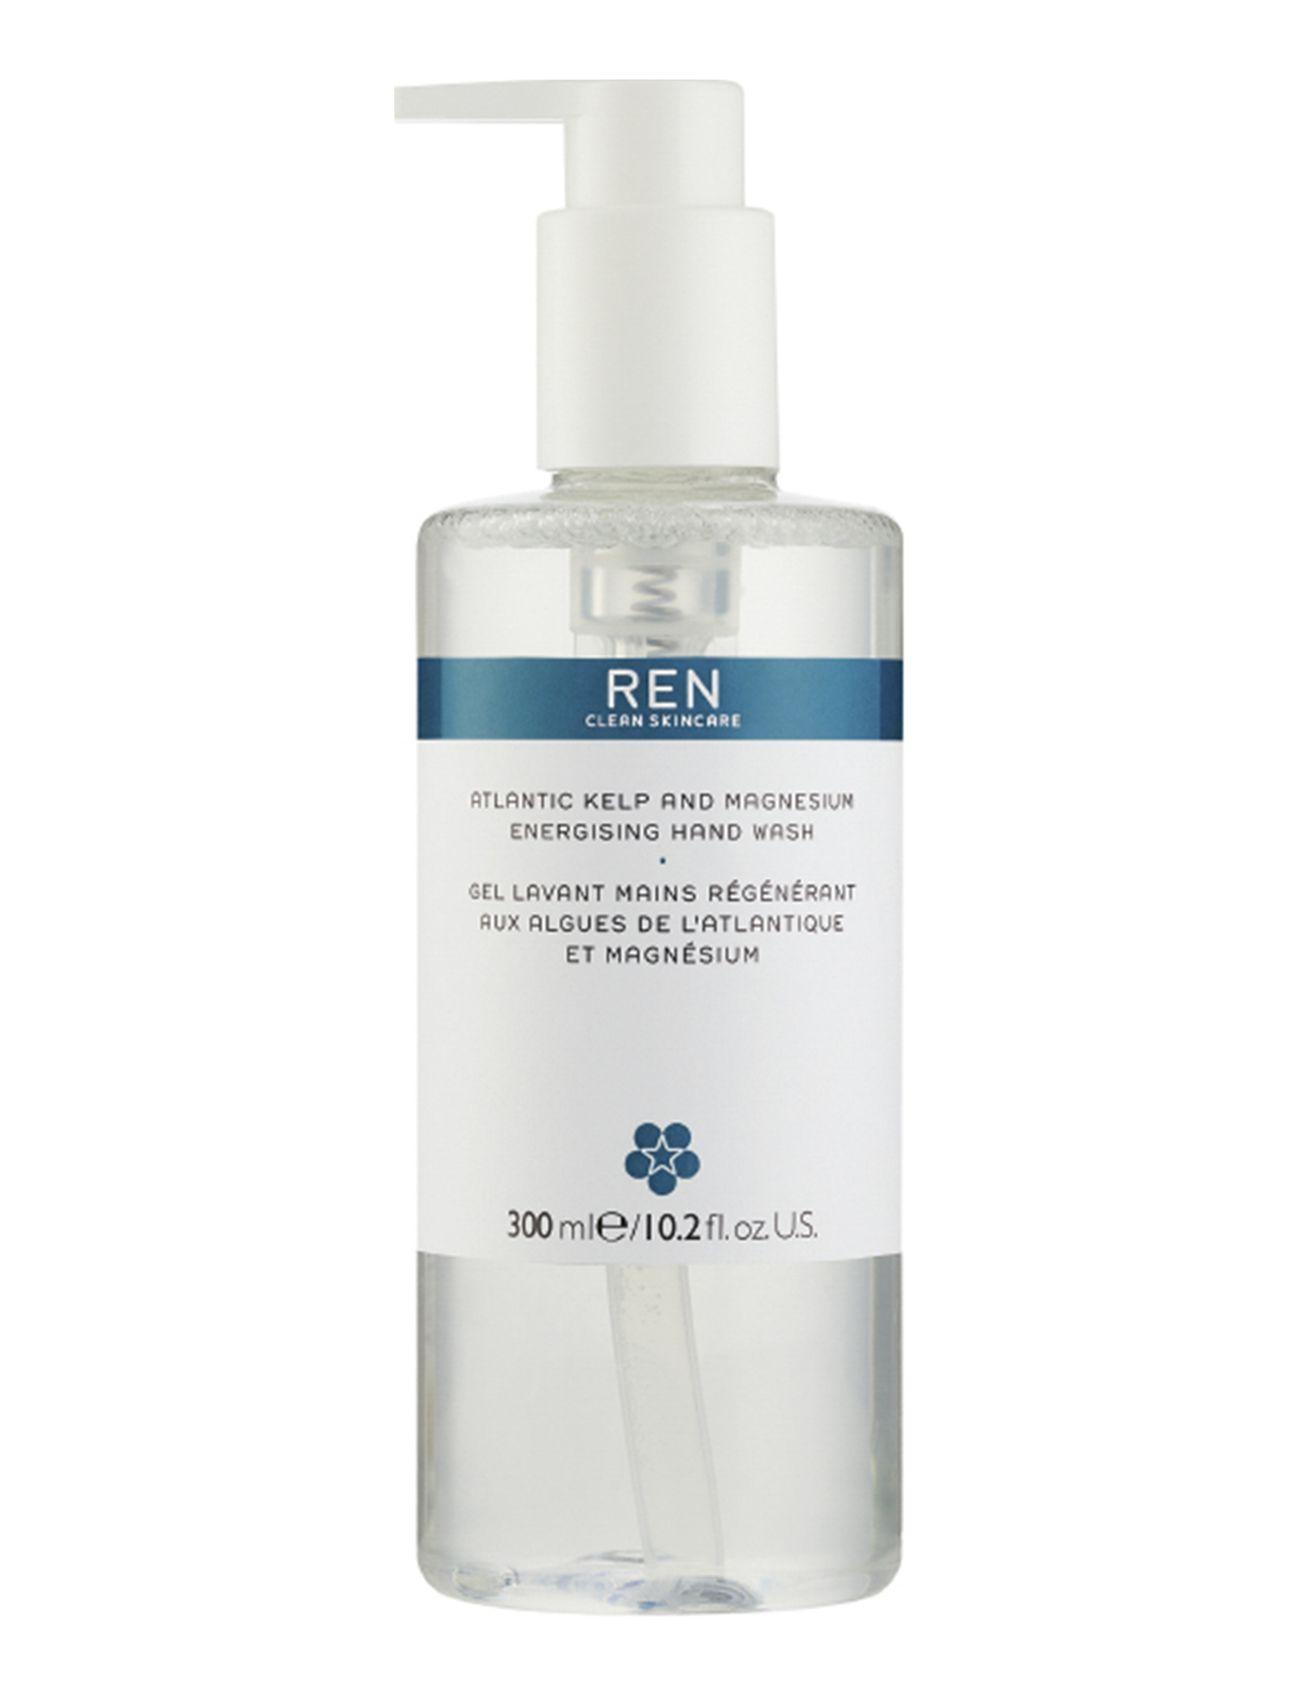 REN ATLANTIC KELP AND MAGNESIUM HAND WASH 300 ml